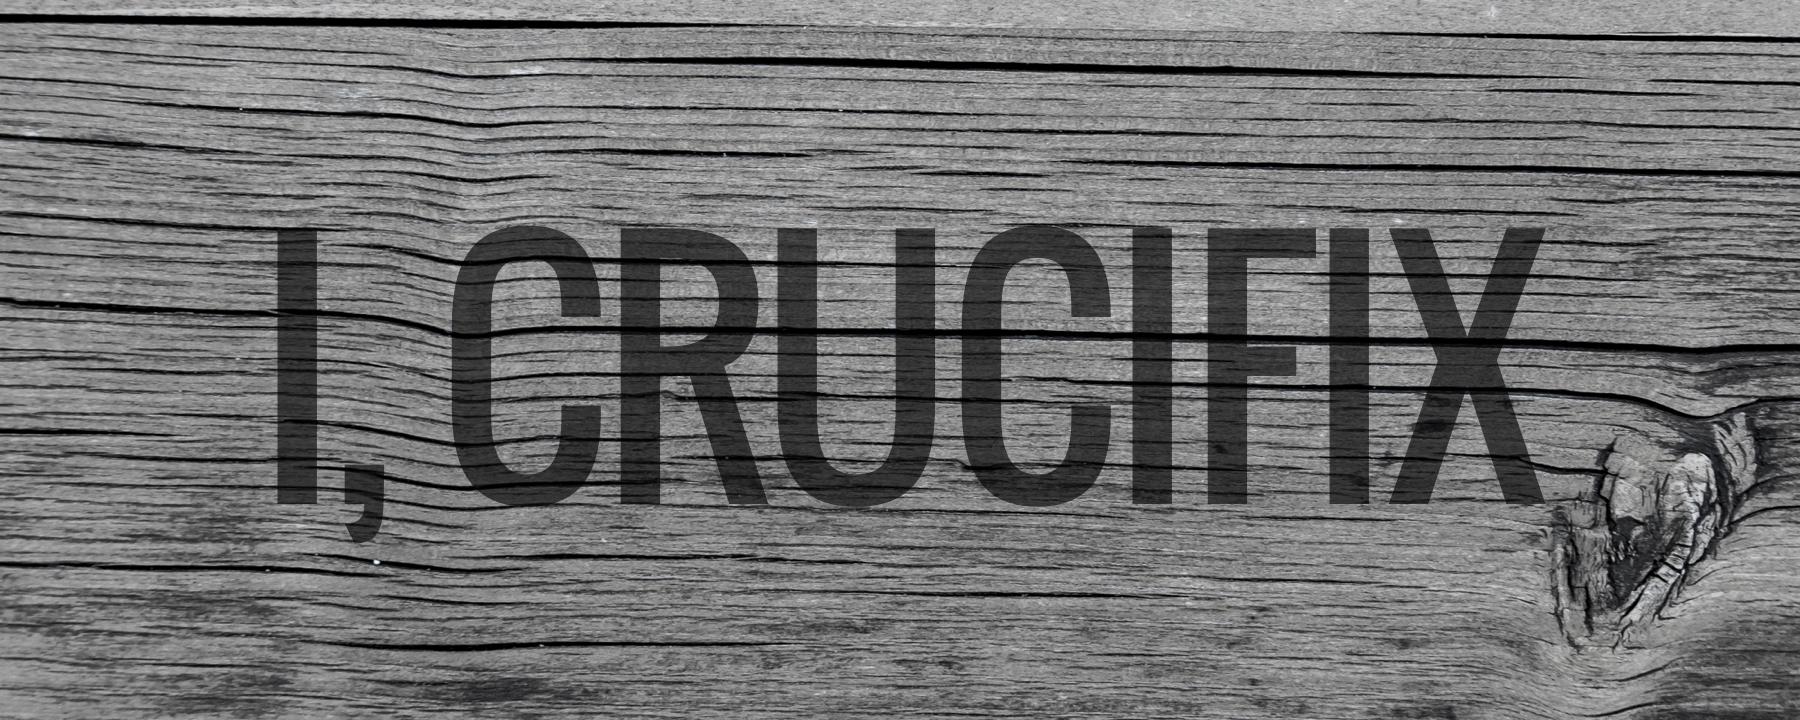 Icrucifix